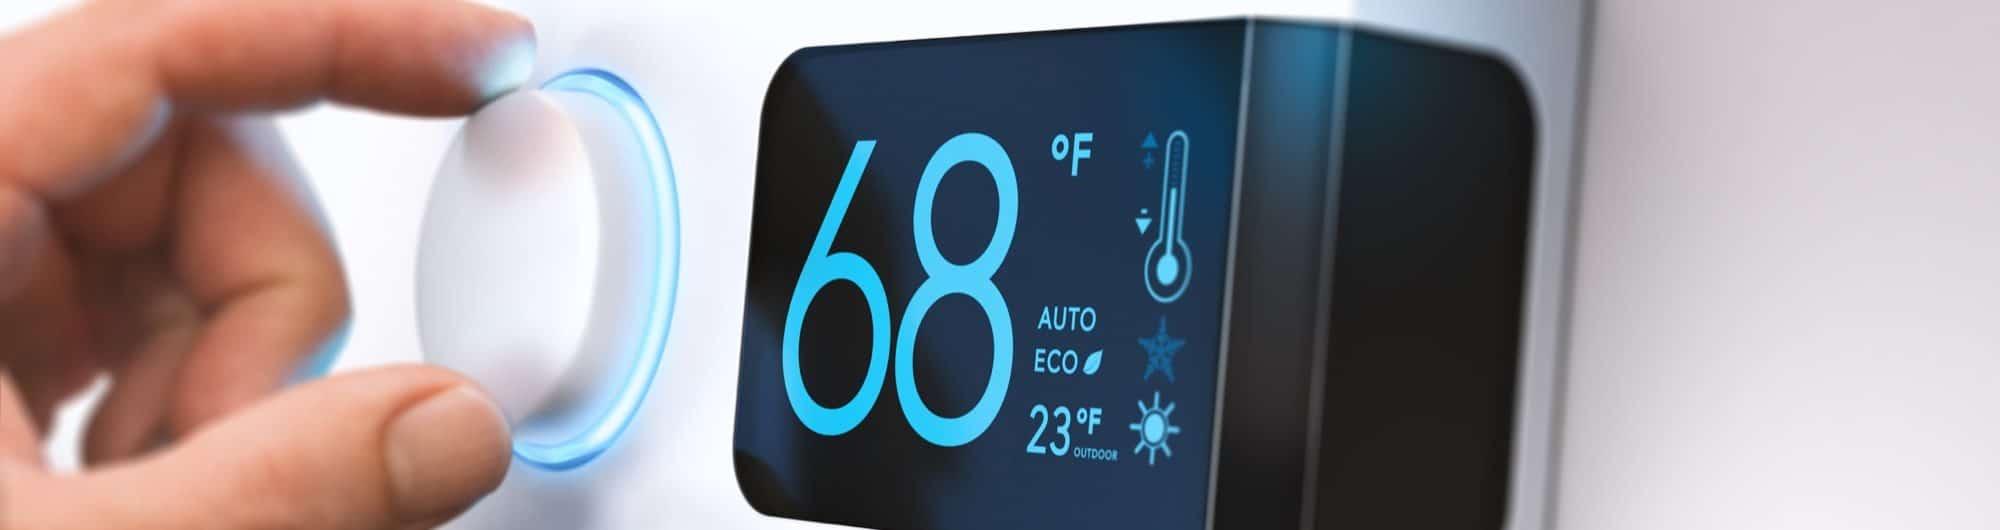 Heating Assistance Liheap Penquis